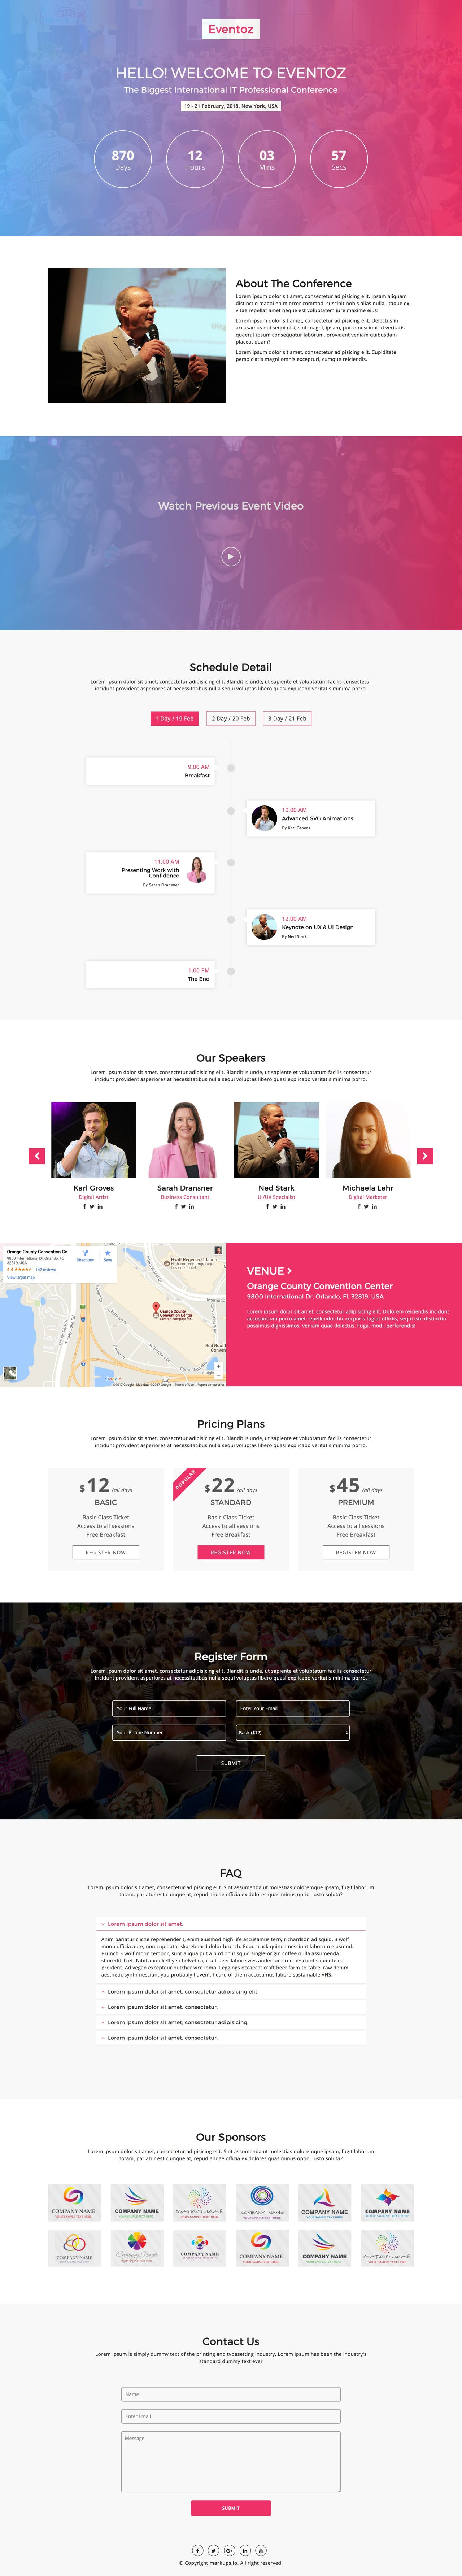 Eventoz - free event HTML template